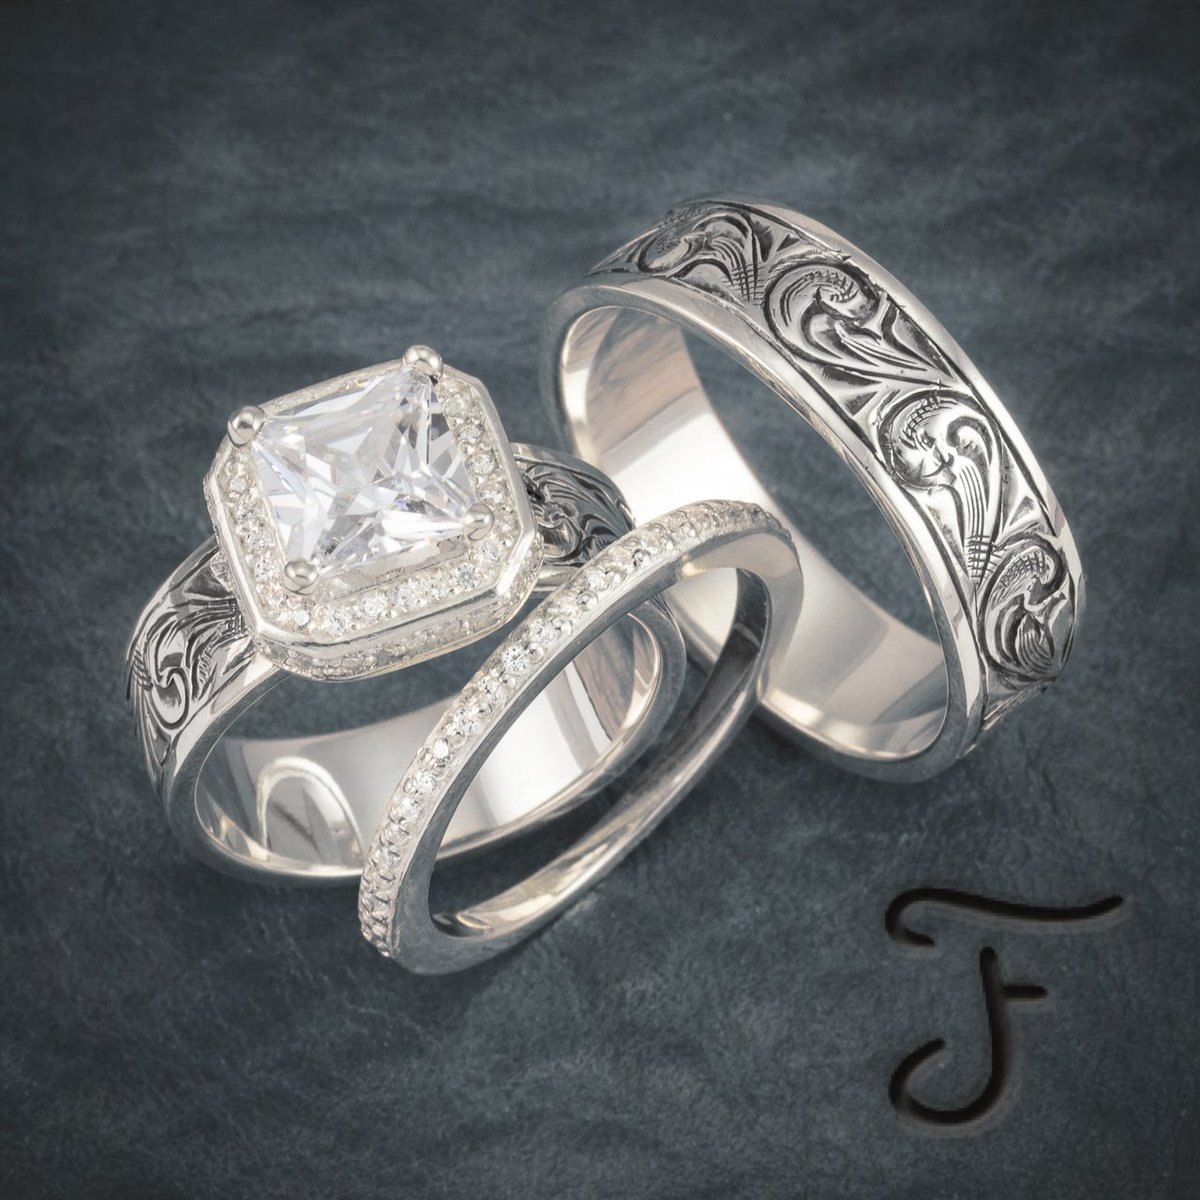 331 Pm 11 Sep 2018: Western Wedding Rings Marriage At Websimilar.org